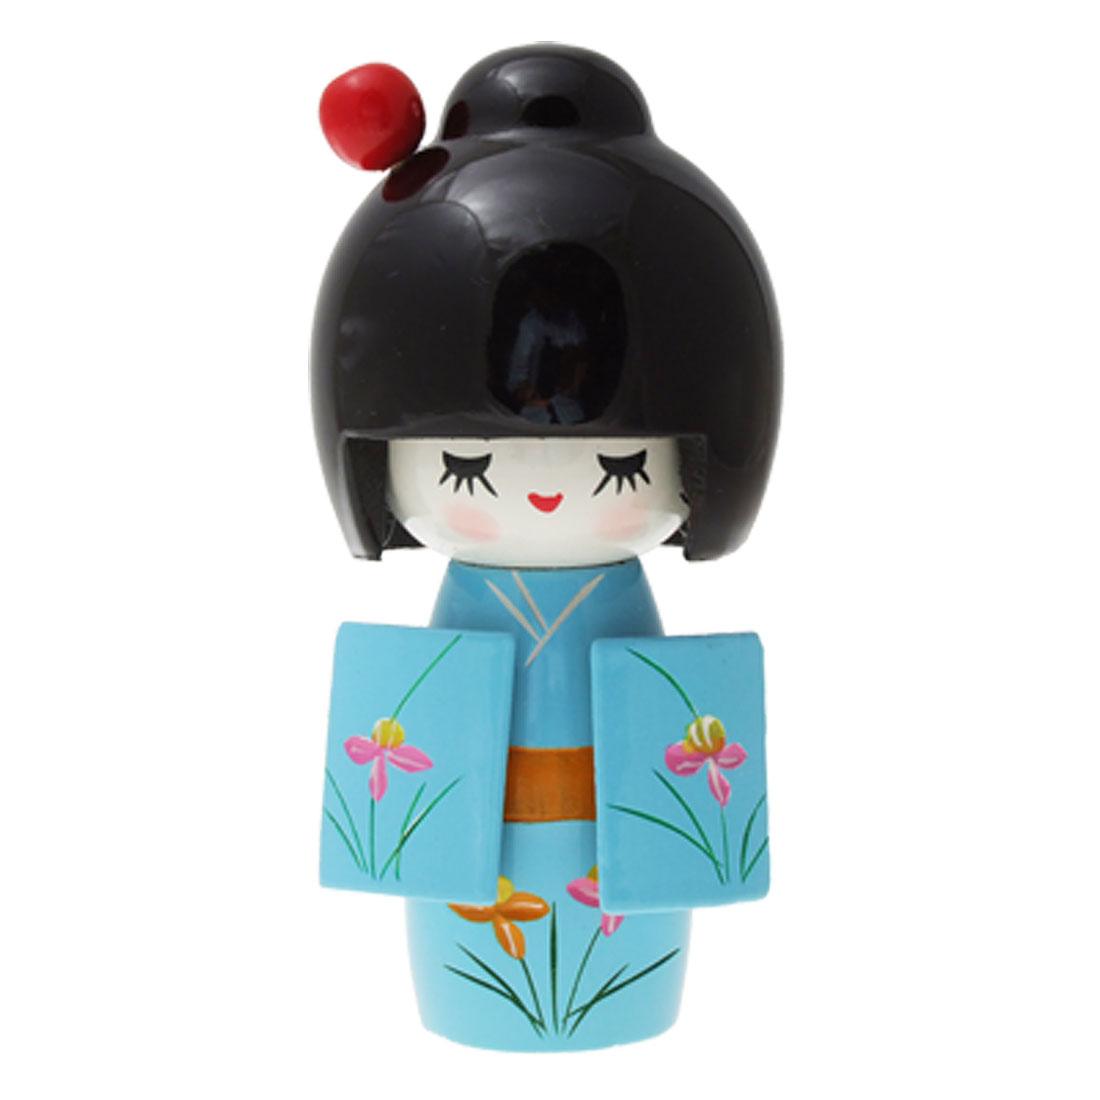 Wooden Japan Kimono Kokeshi Doll Desk Table Decor Babyblue